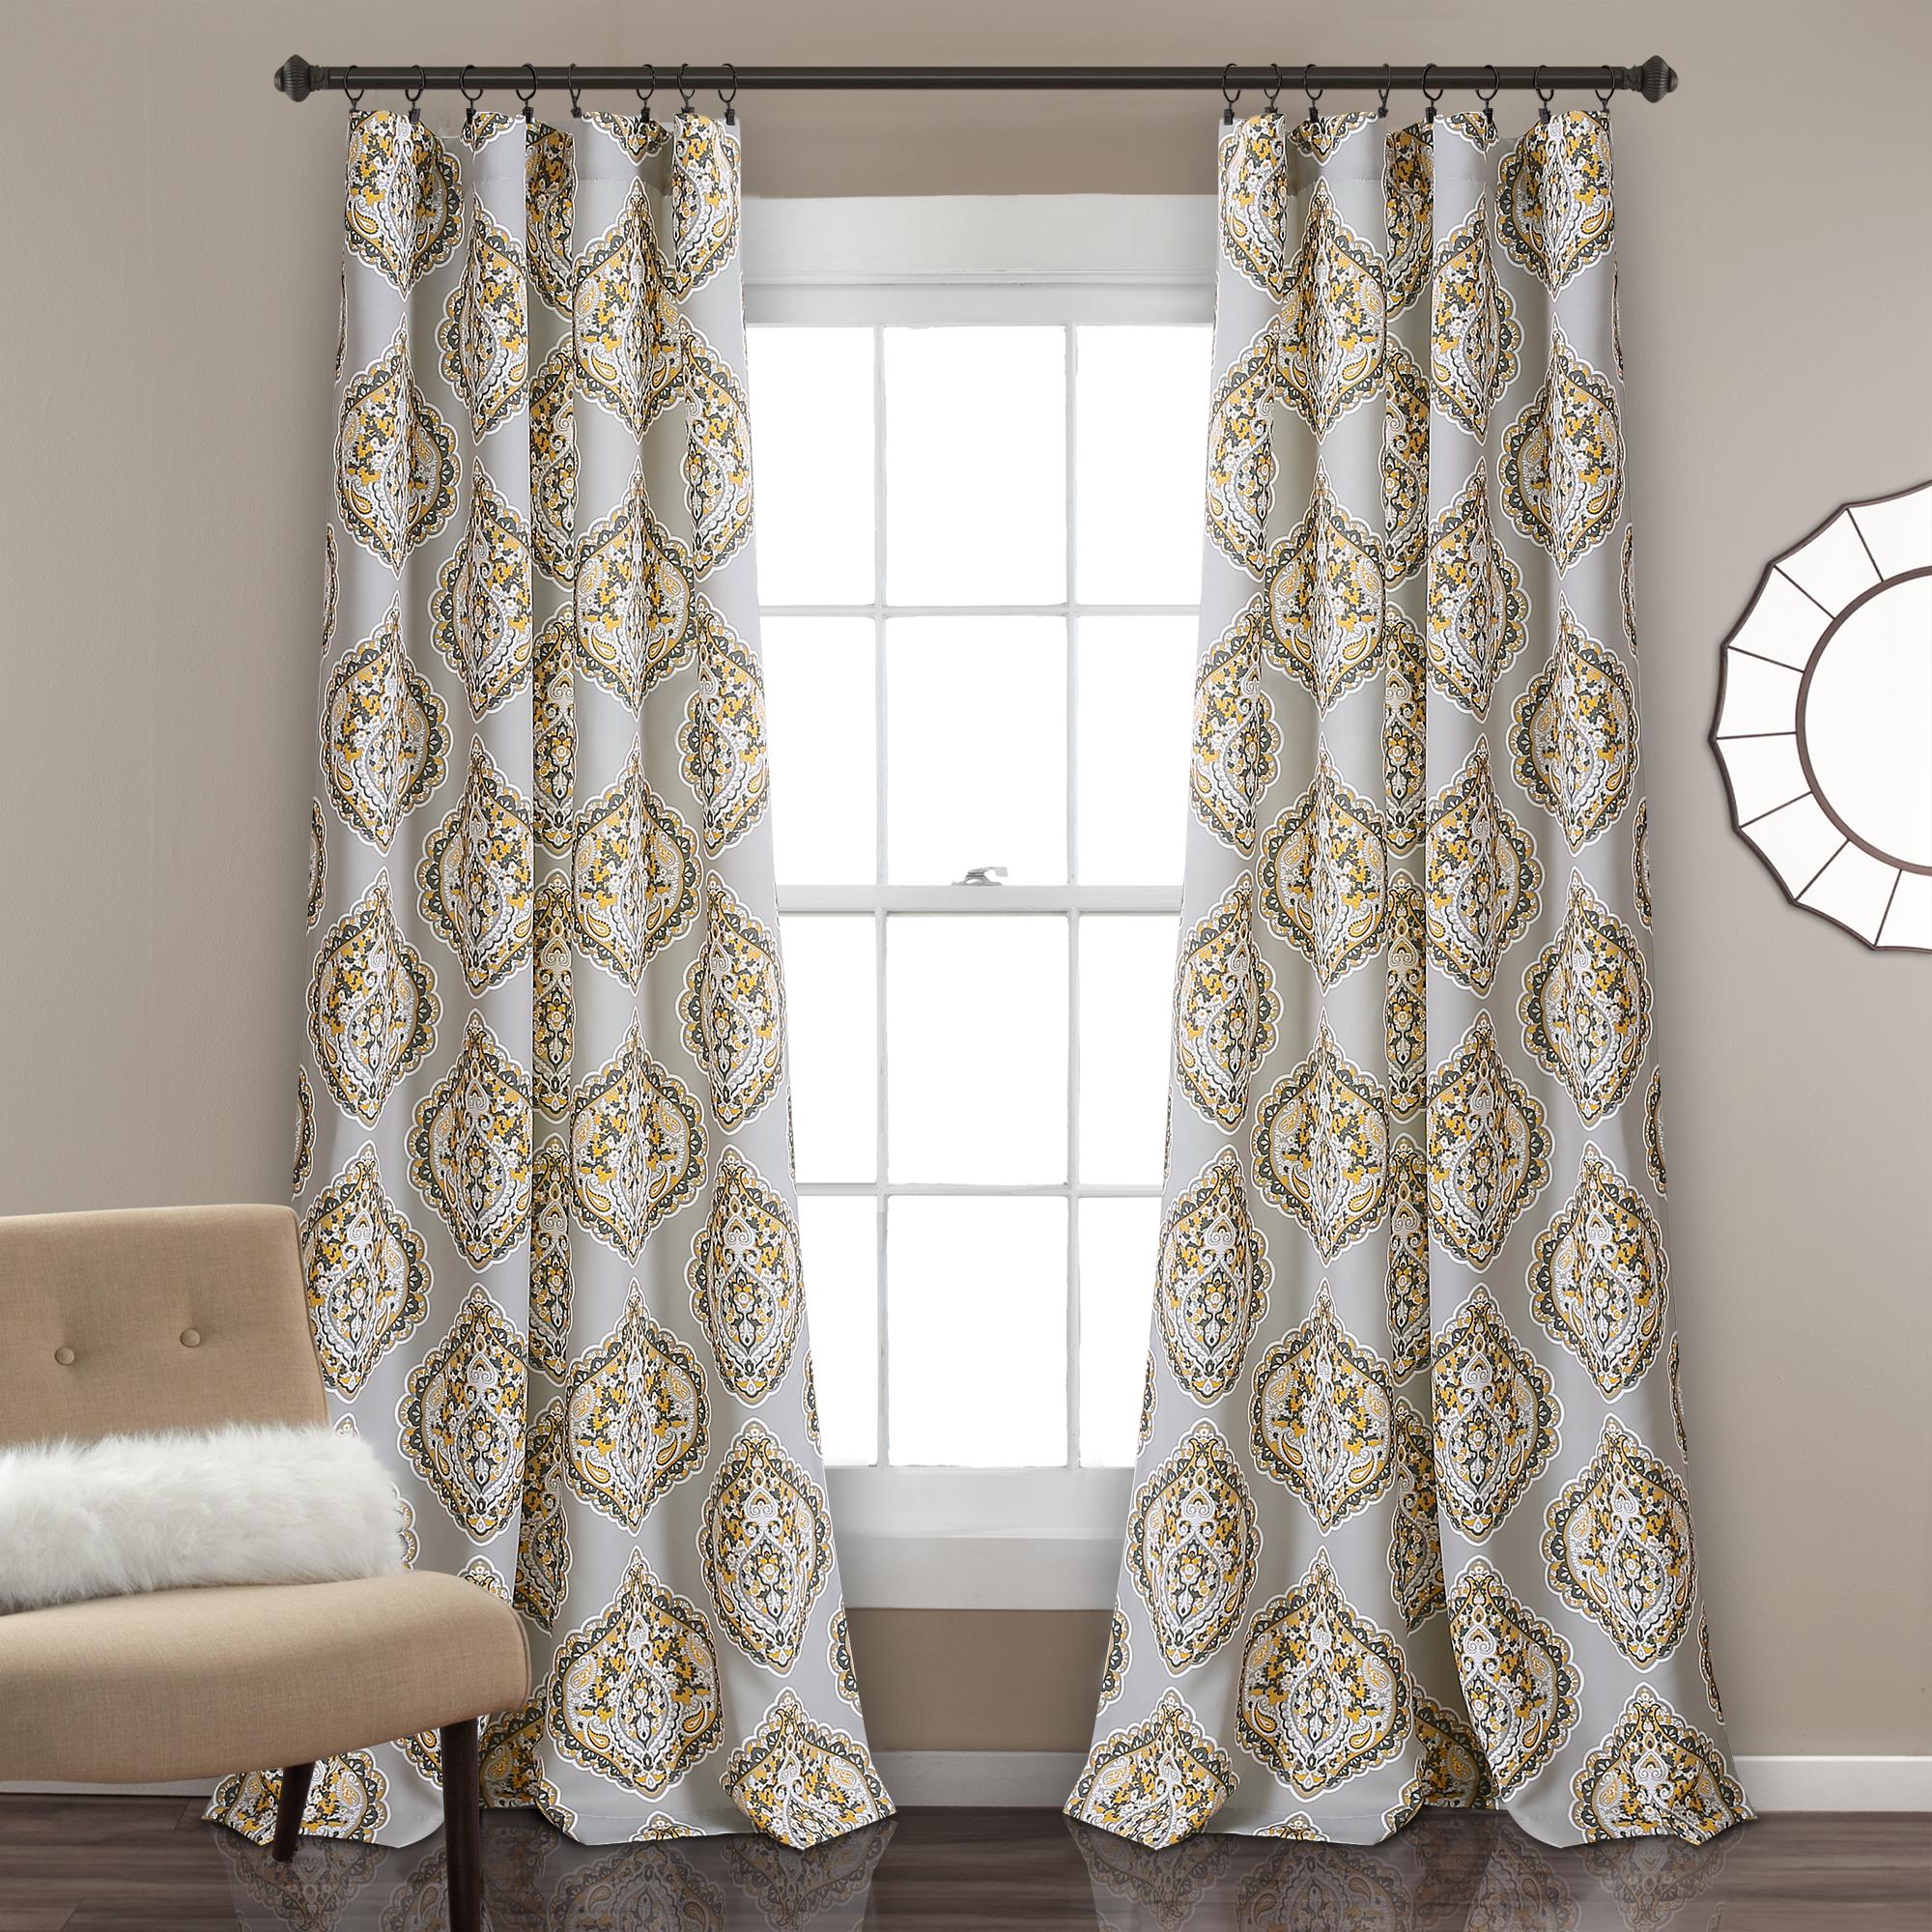 Harley Room Darkening Window Curtain Panels Yellow/Gray Set 52x84